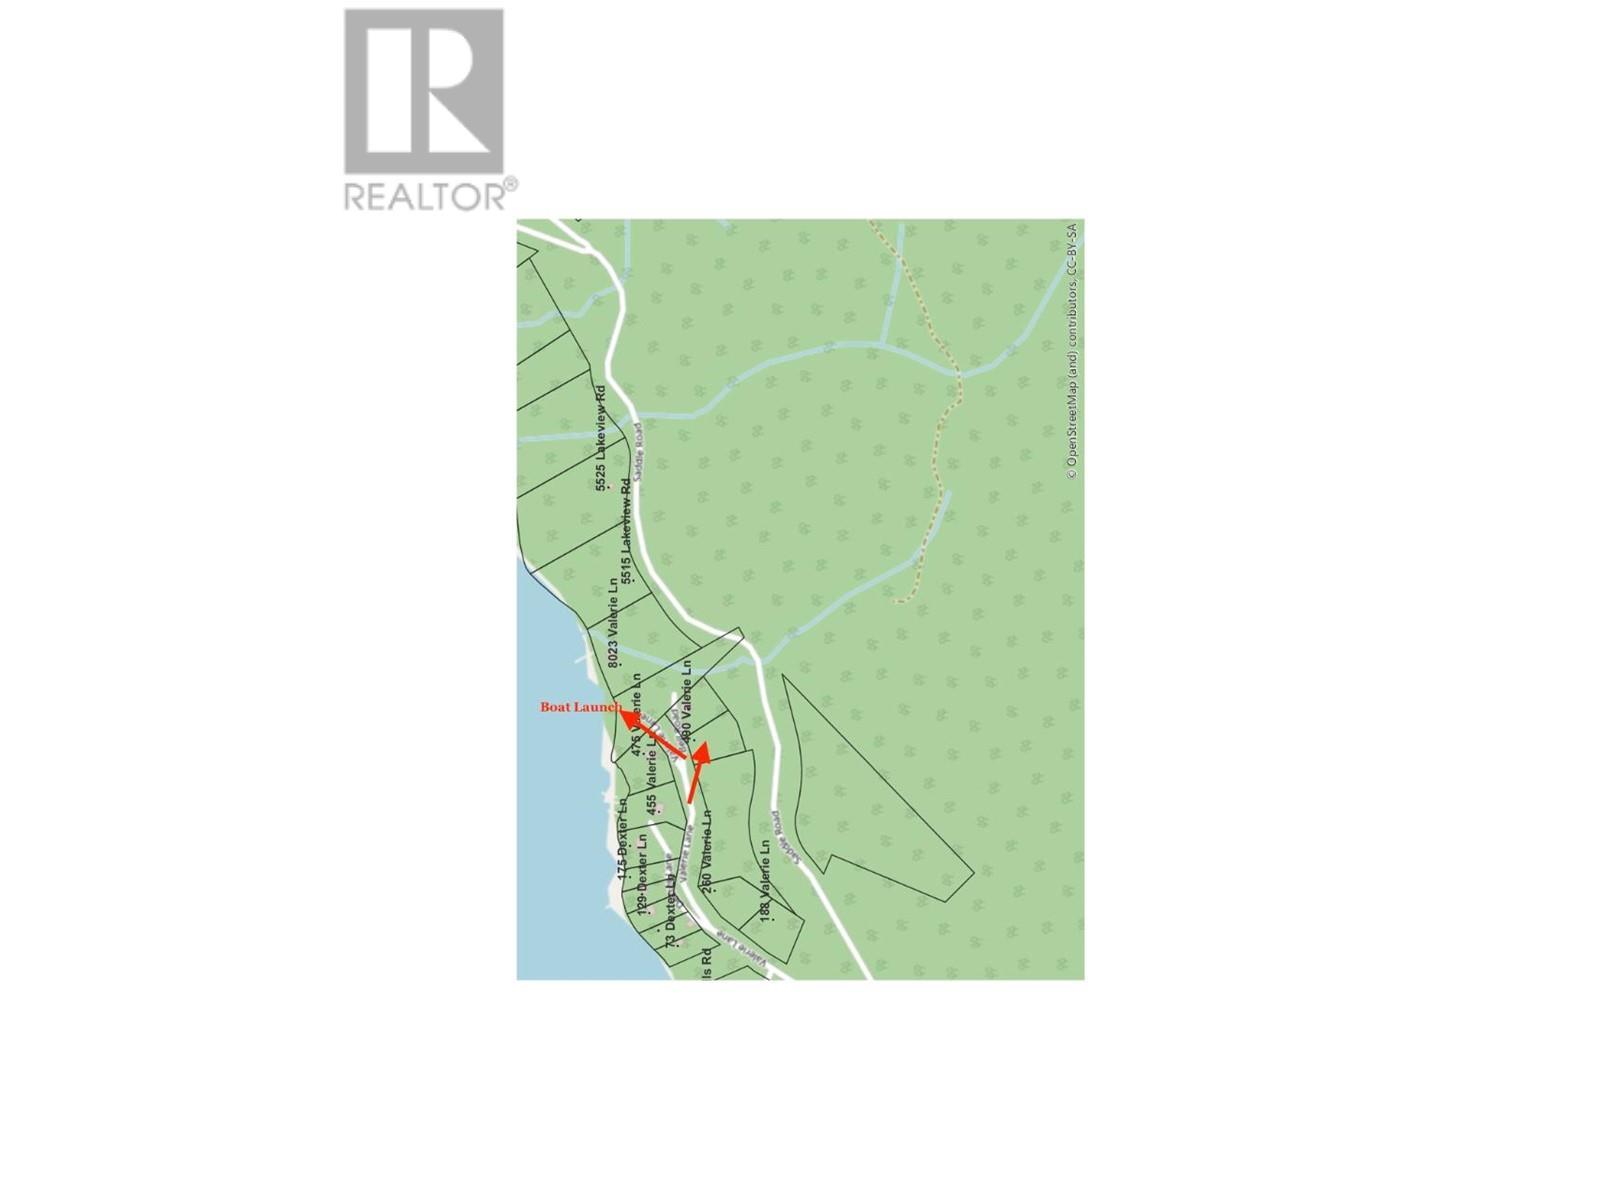 LT 7 3RD A LINE, Kimberley 163363